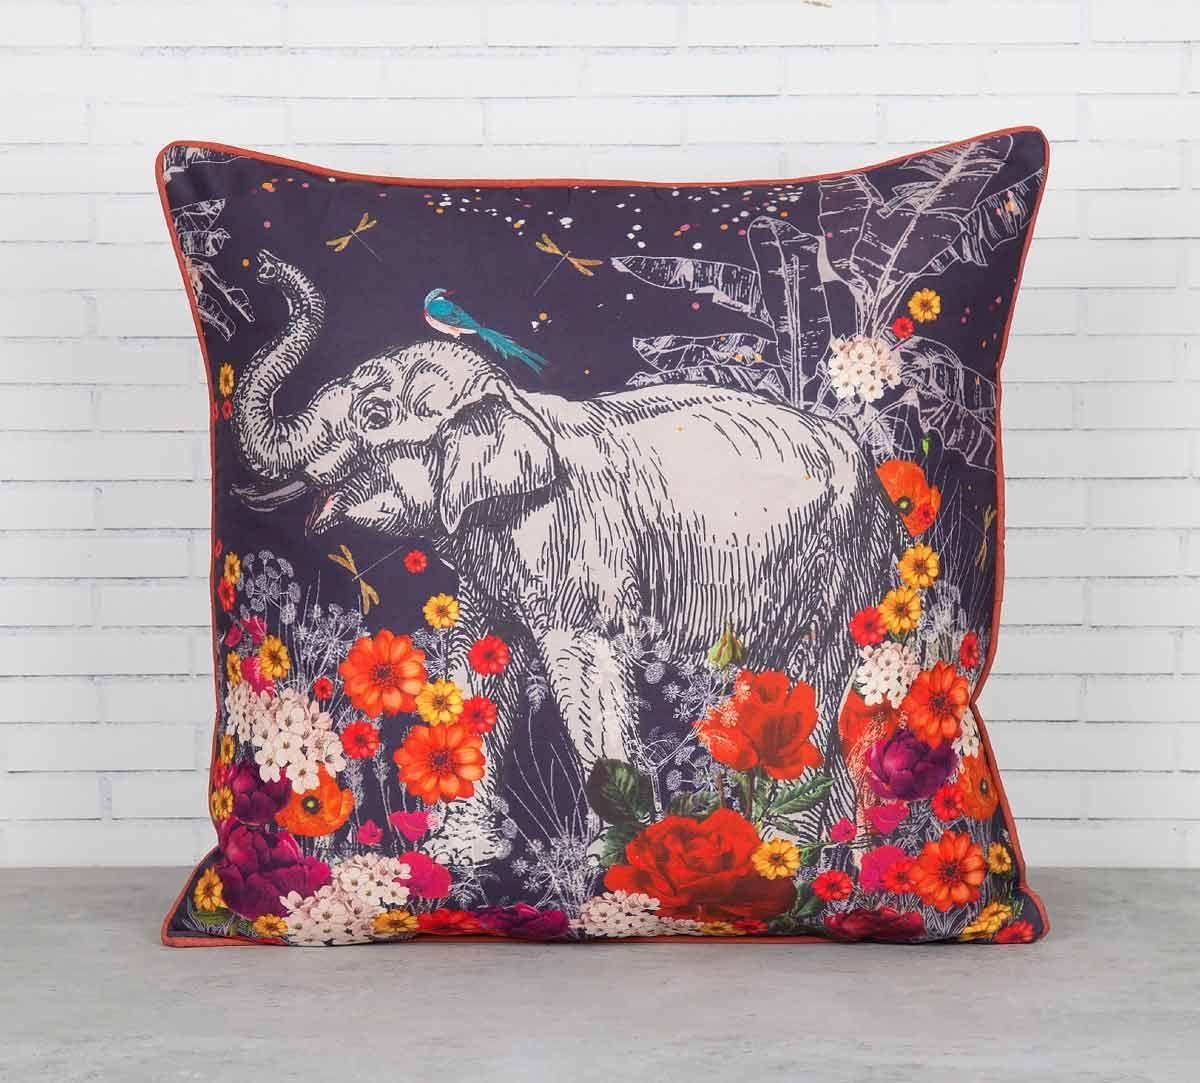 India Circus Paradise Blended Taf Silk Cushion Cover